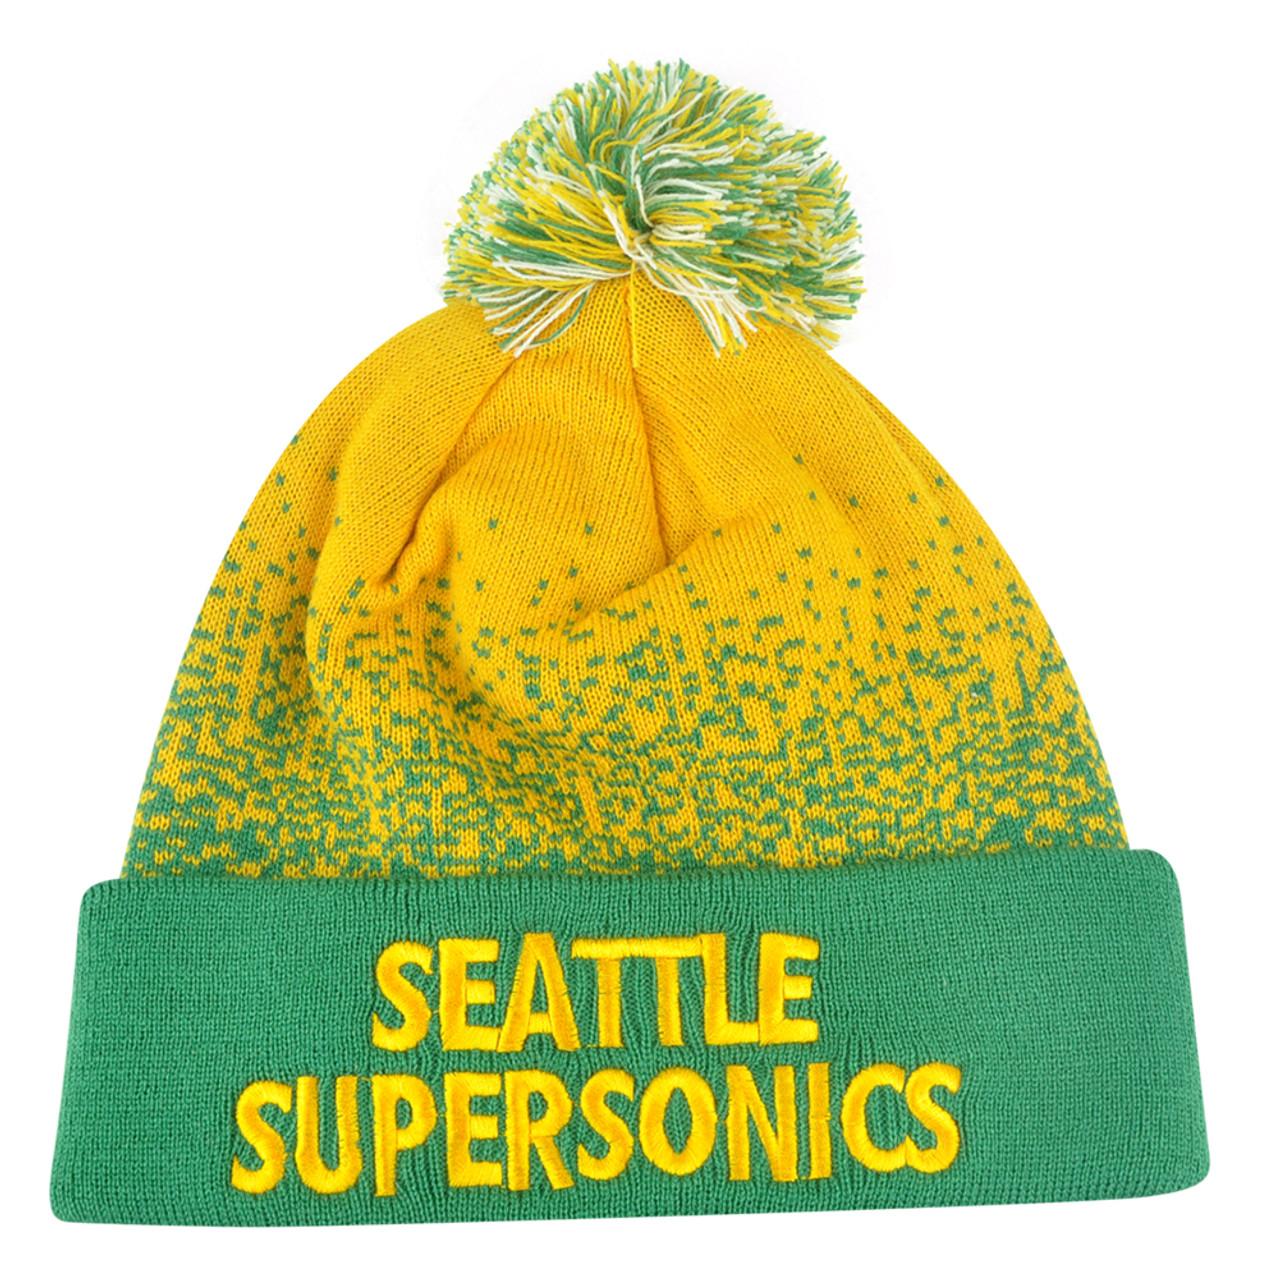 697d5c55a06984 NBA Mitchell Ness Title Knit KM12 Cuffed Pom Pom Beanie Seattle Supersonics  HWC - Cap Store Online.com